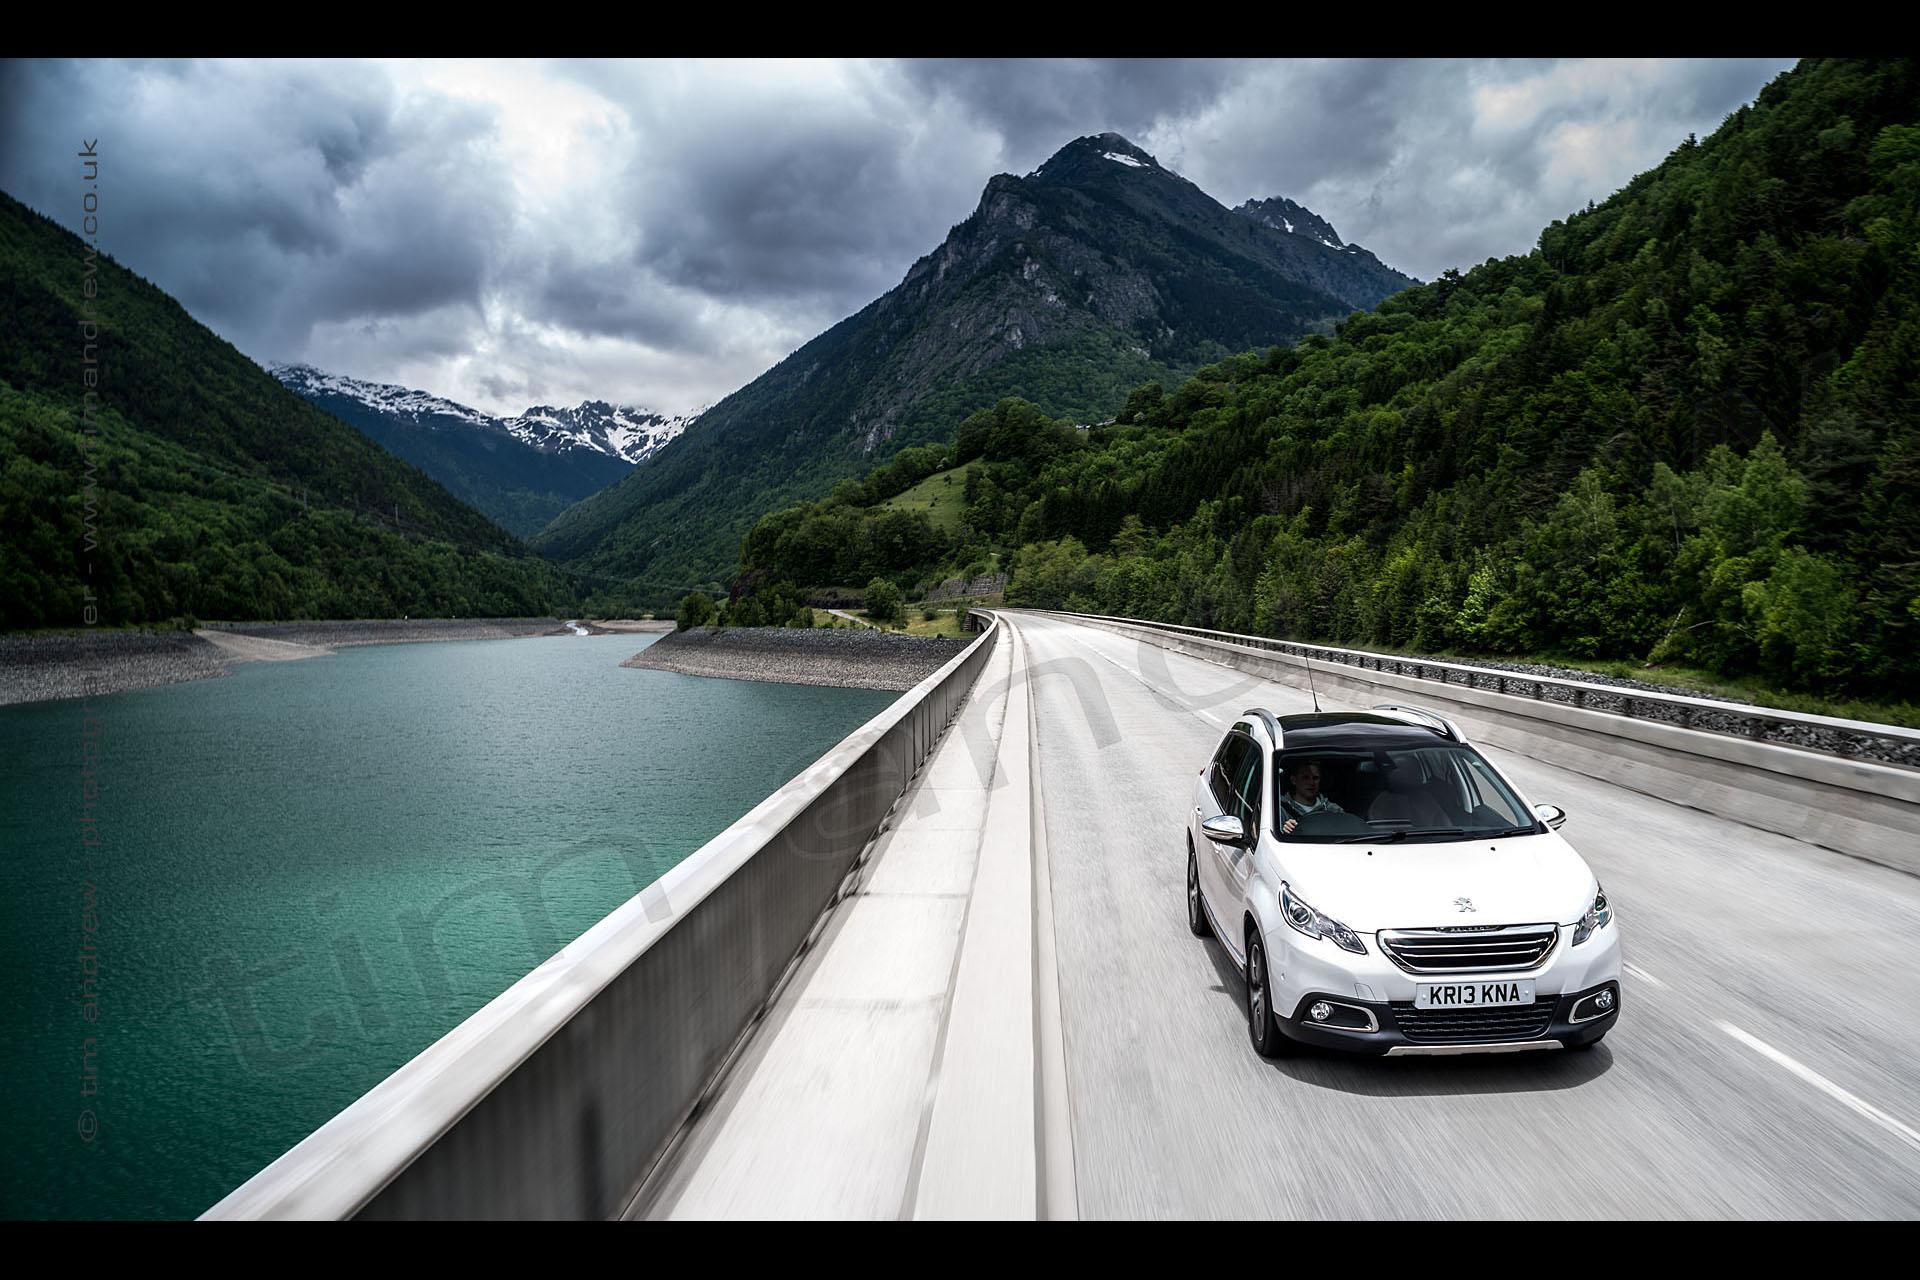 Peugeot 2008 in Alps